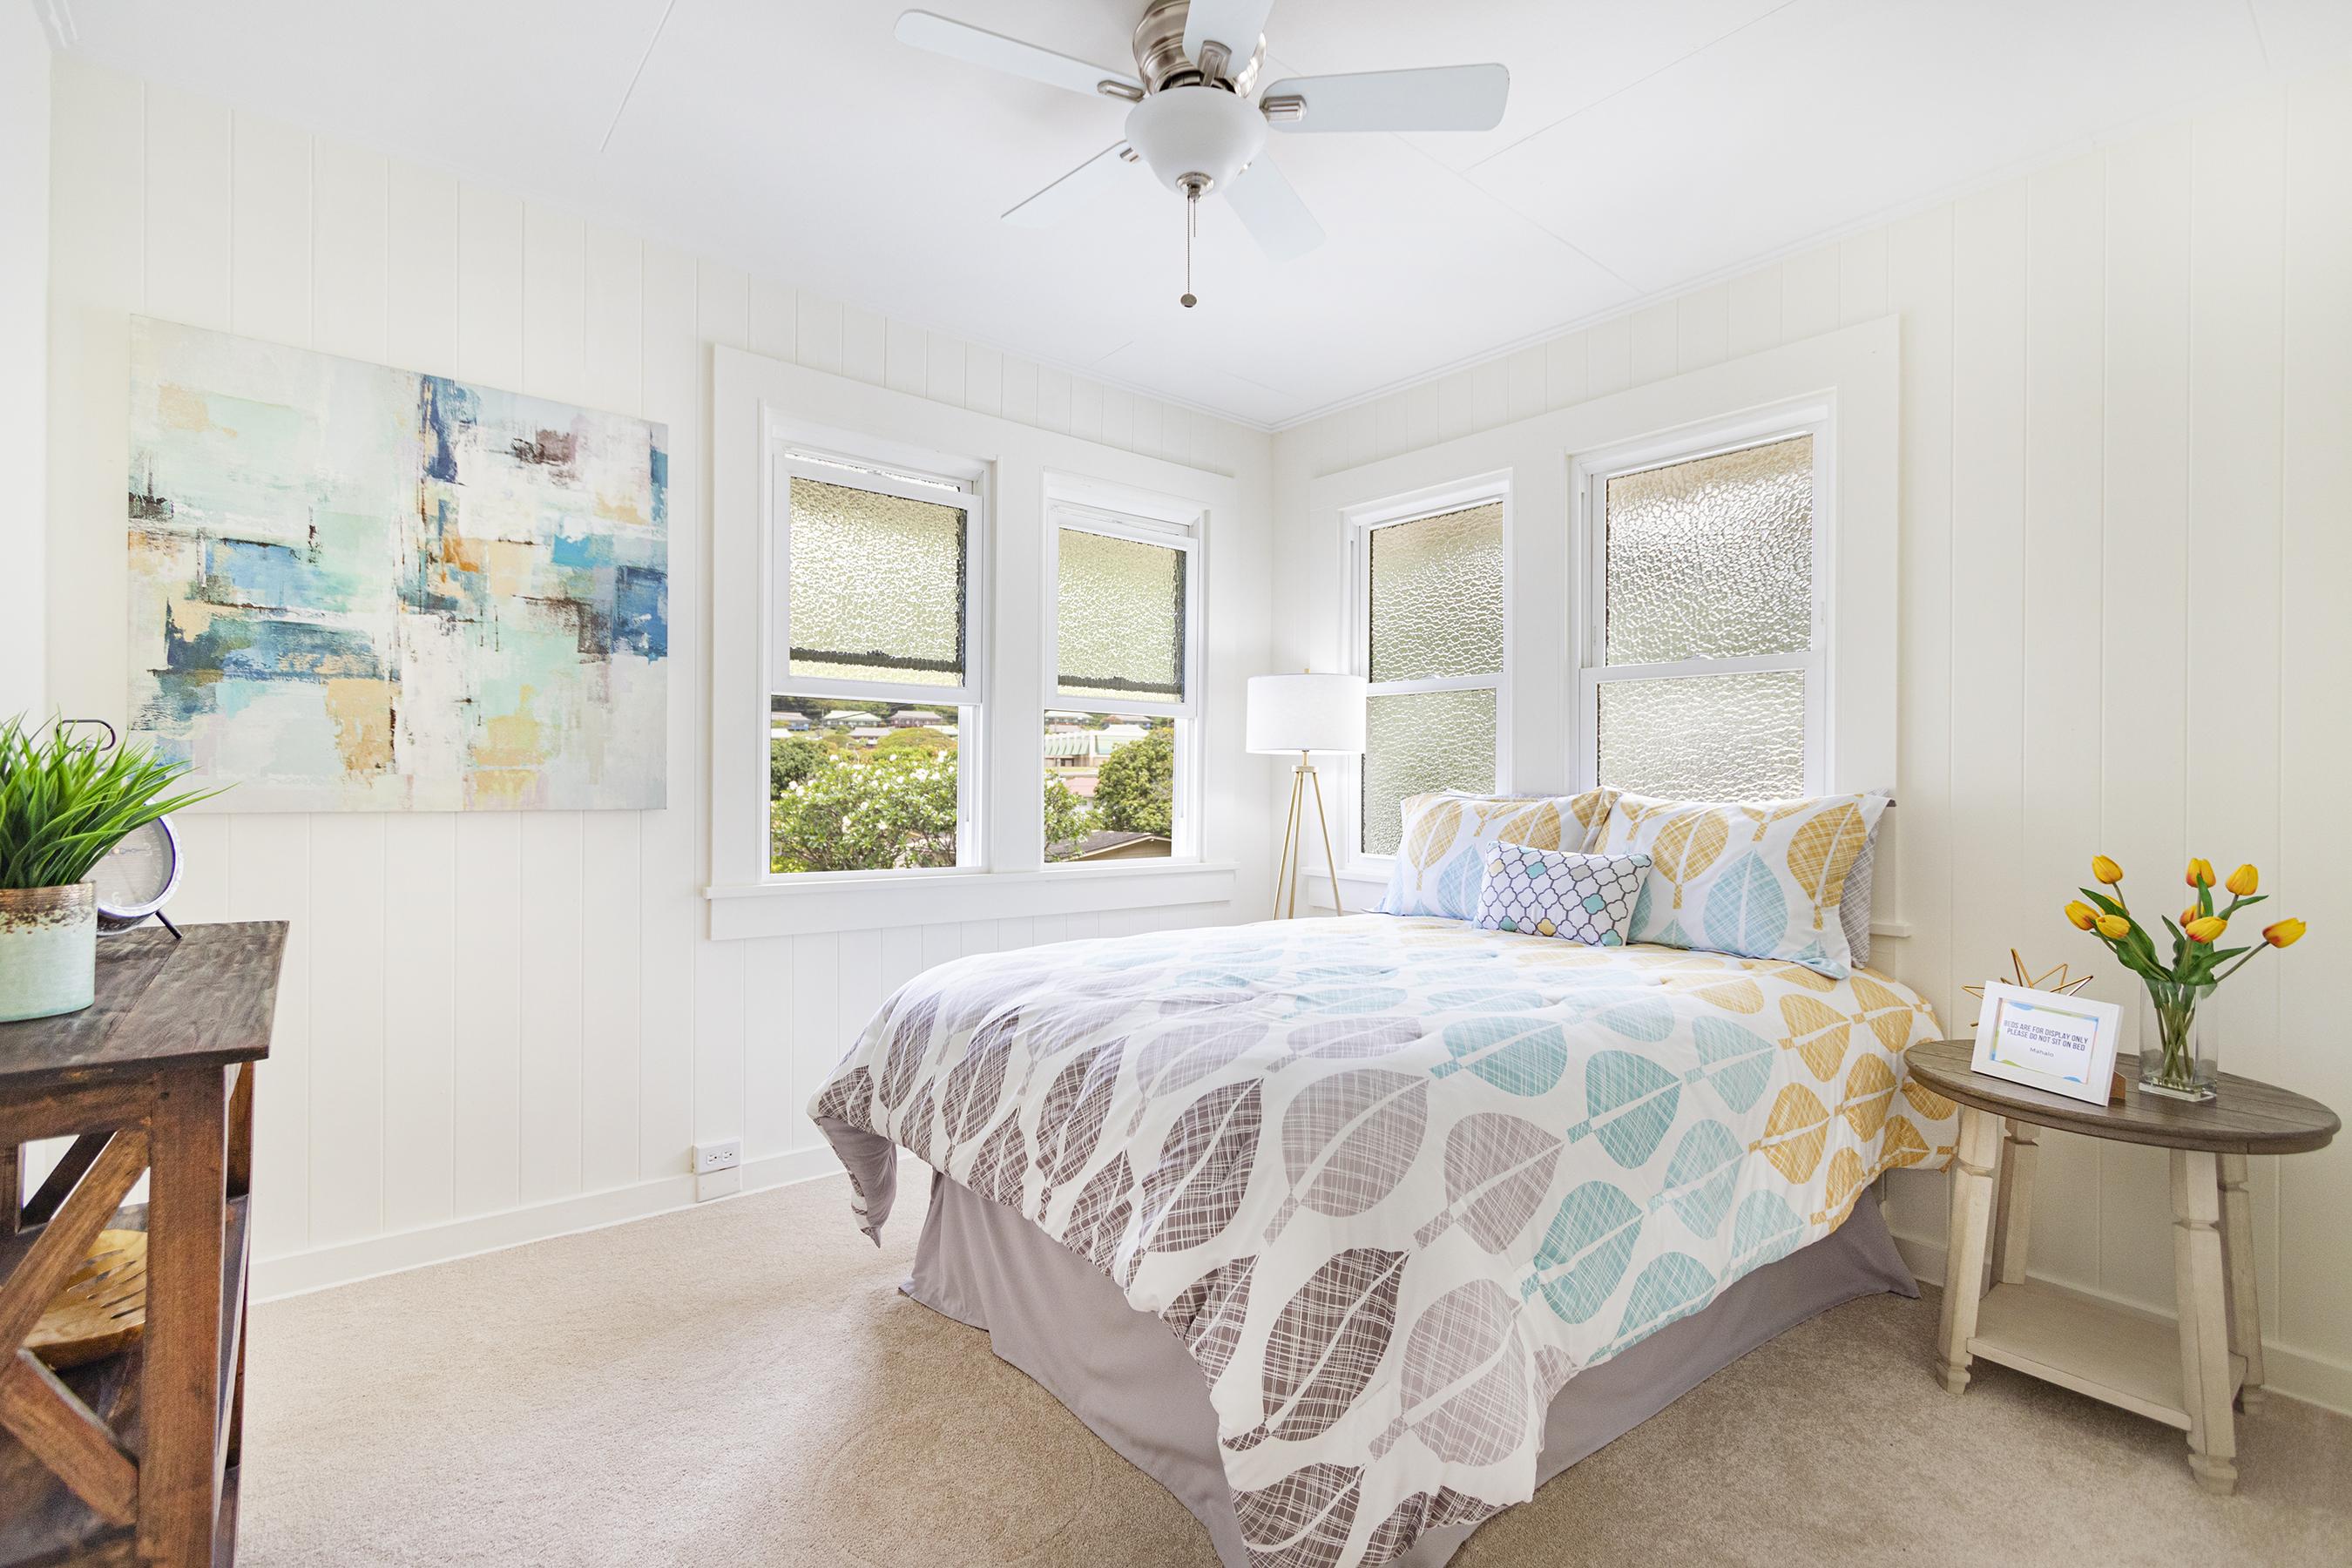 Second bedroom at 1955 9th Avenue, Honolulu 96816